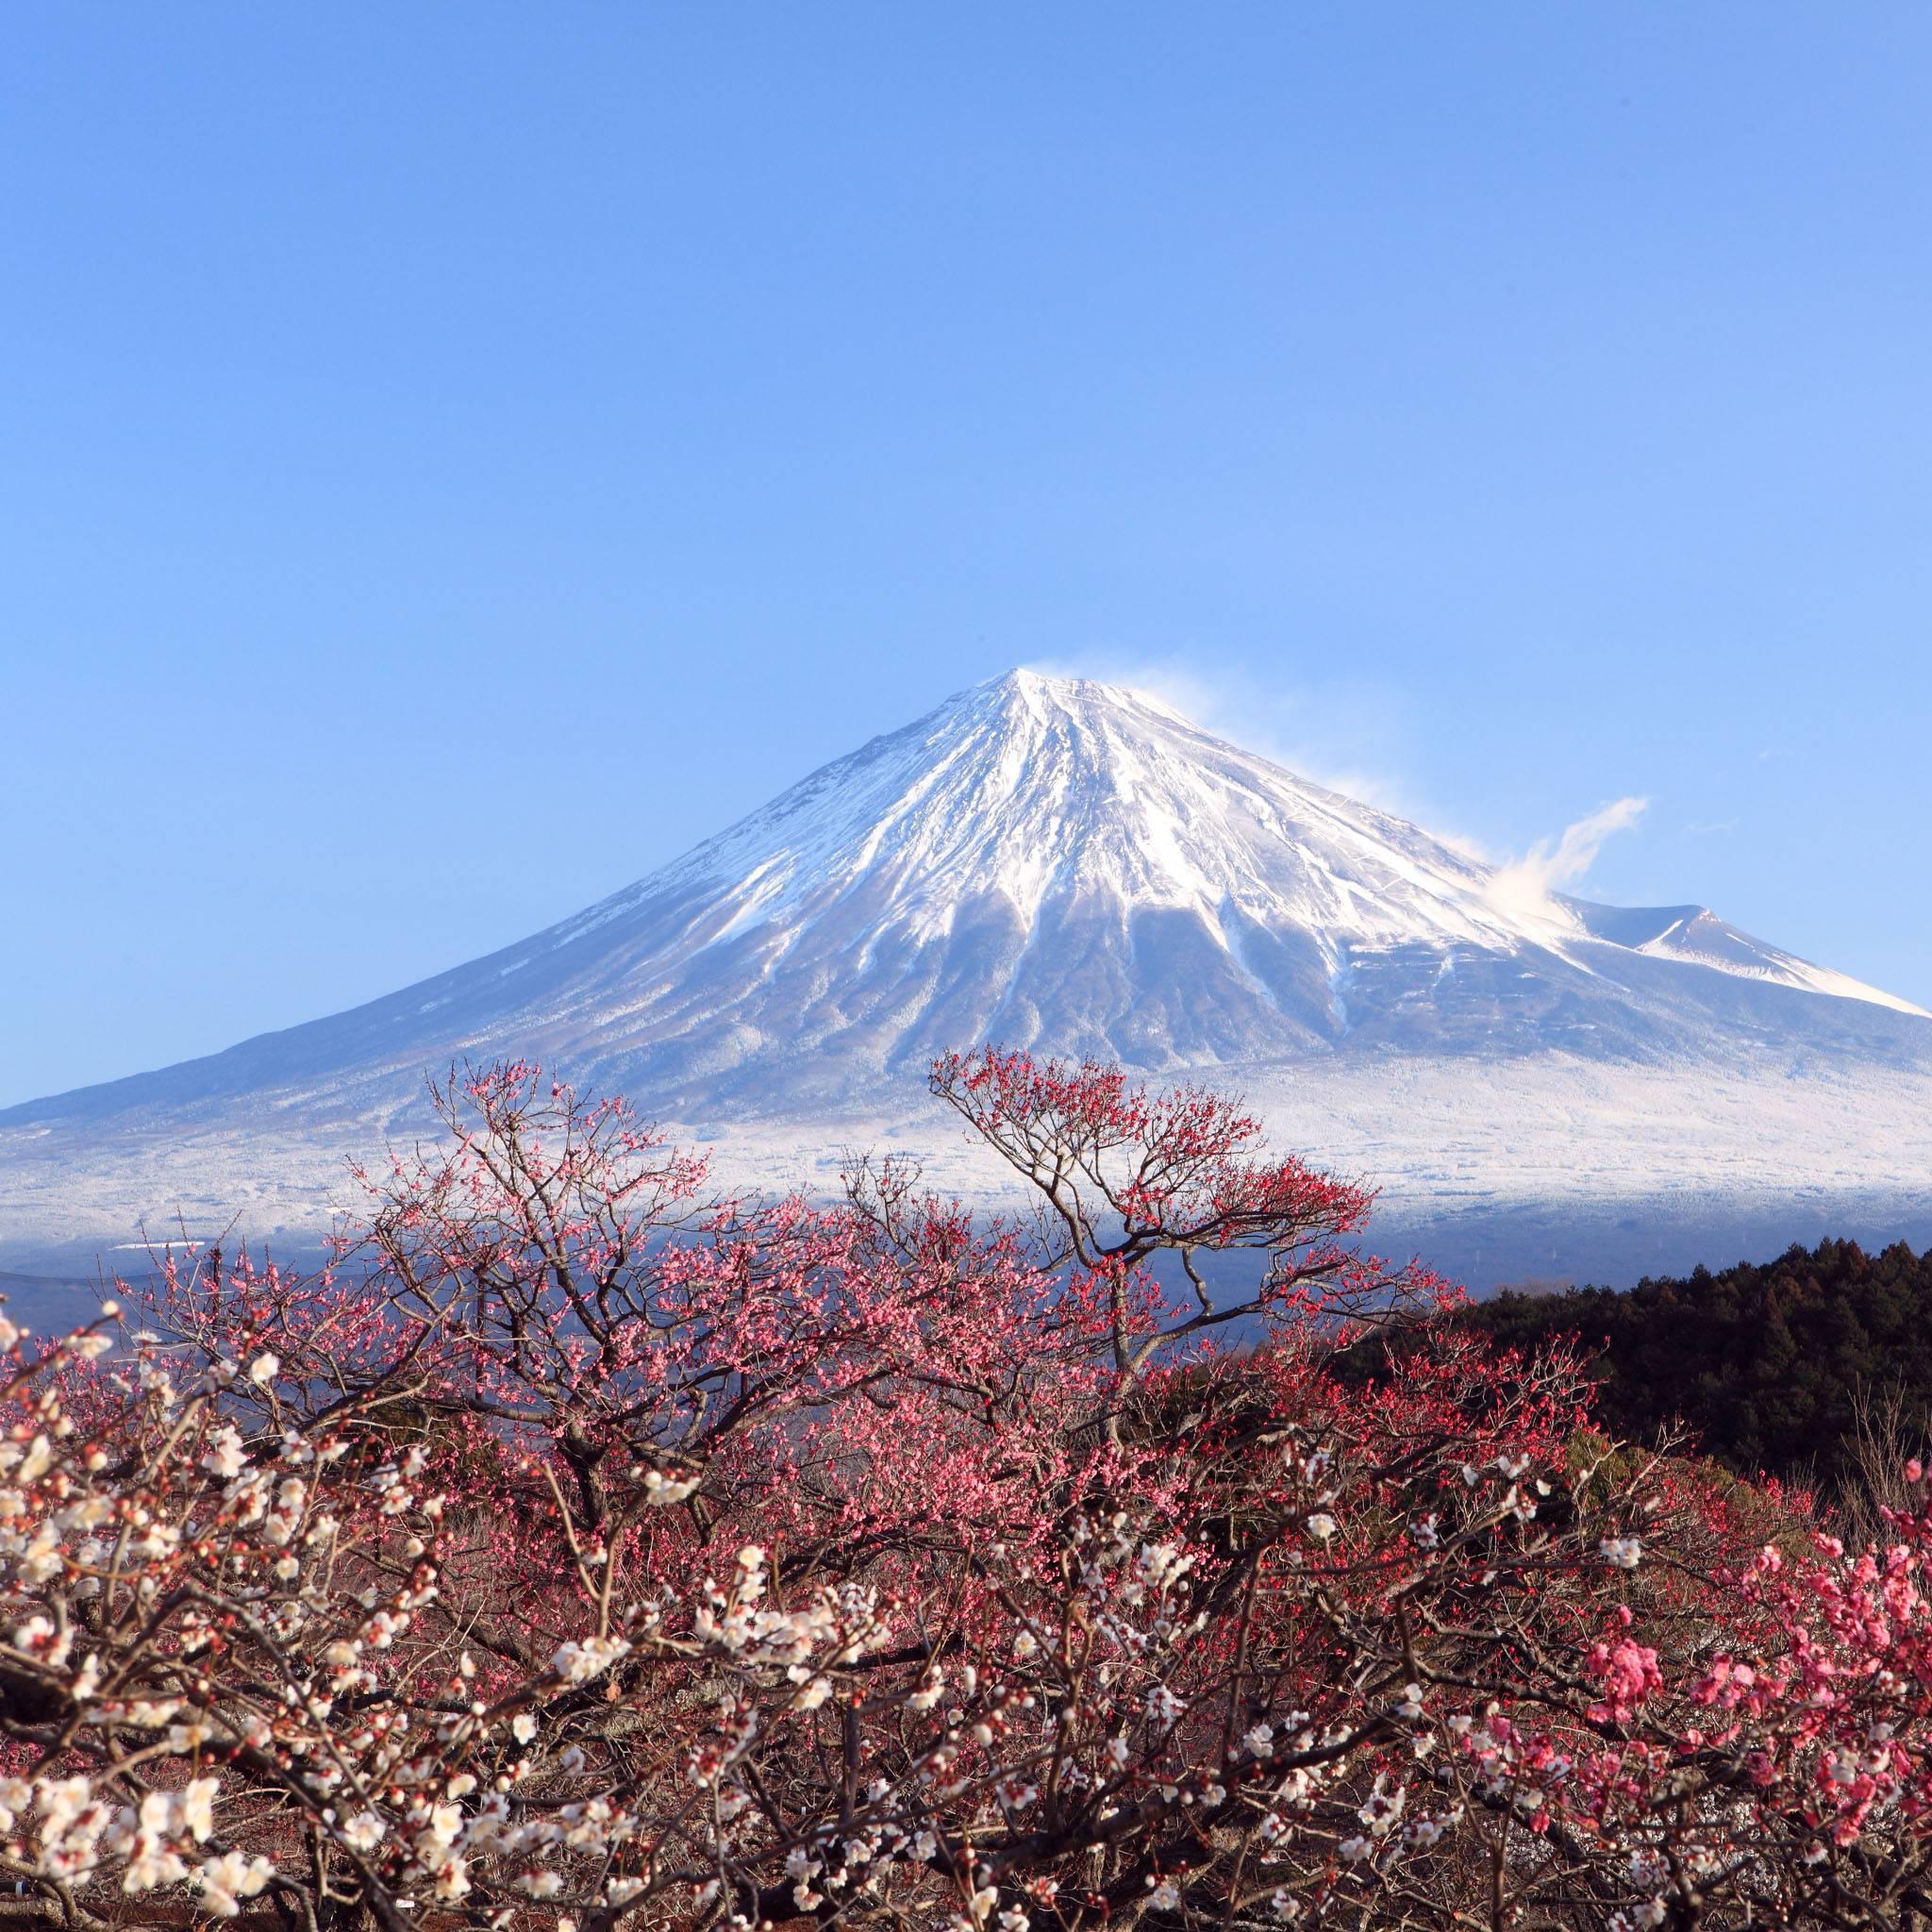 Mount Fuji Wallpapers